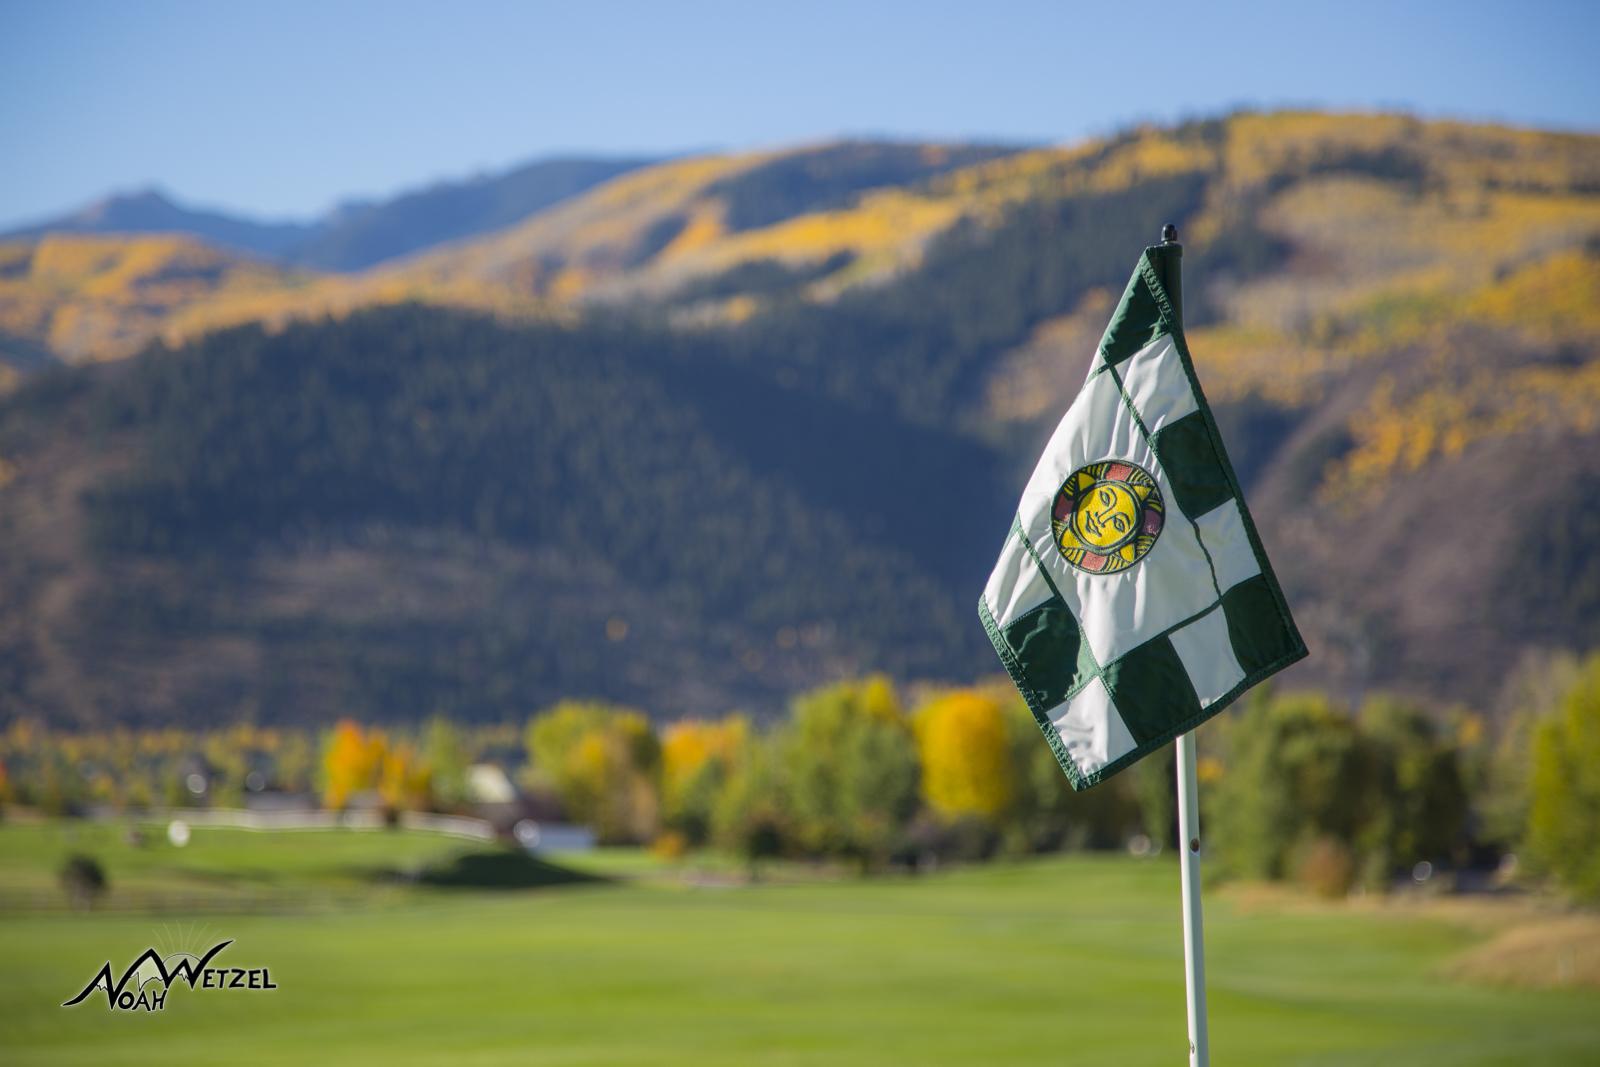 Sonnenalp Club. Vail Colorado